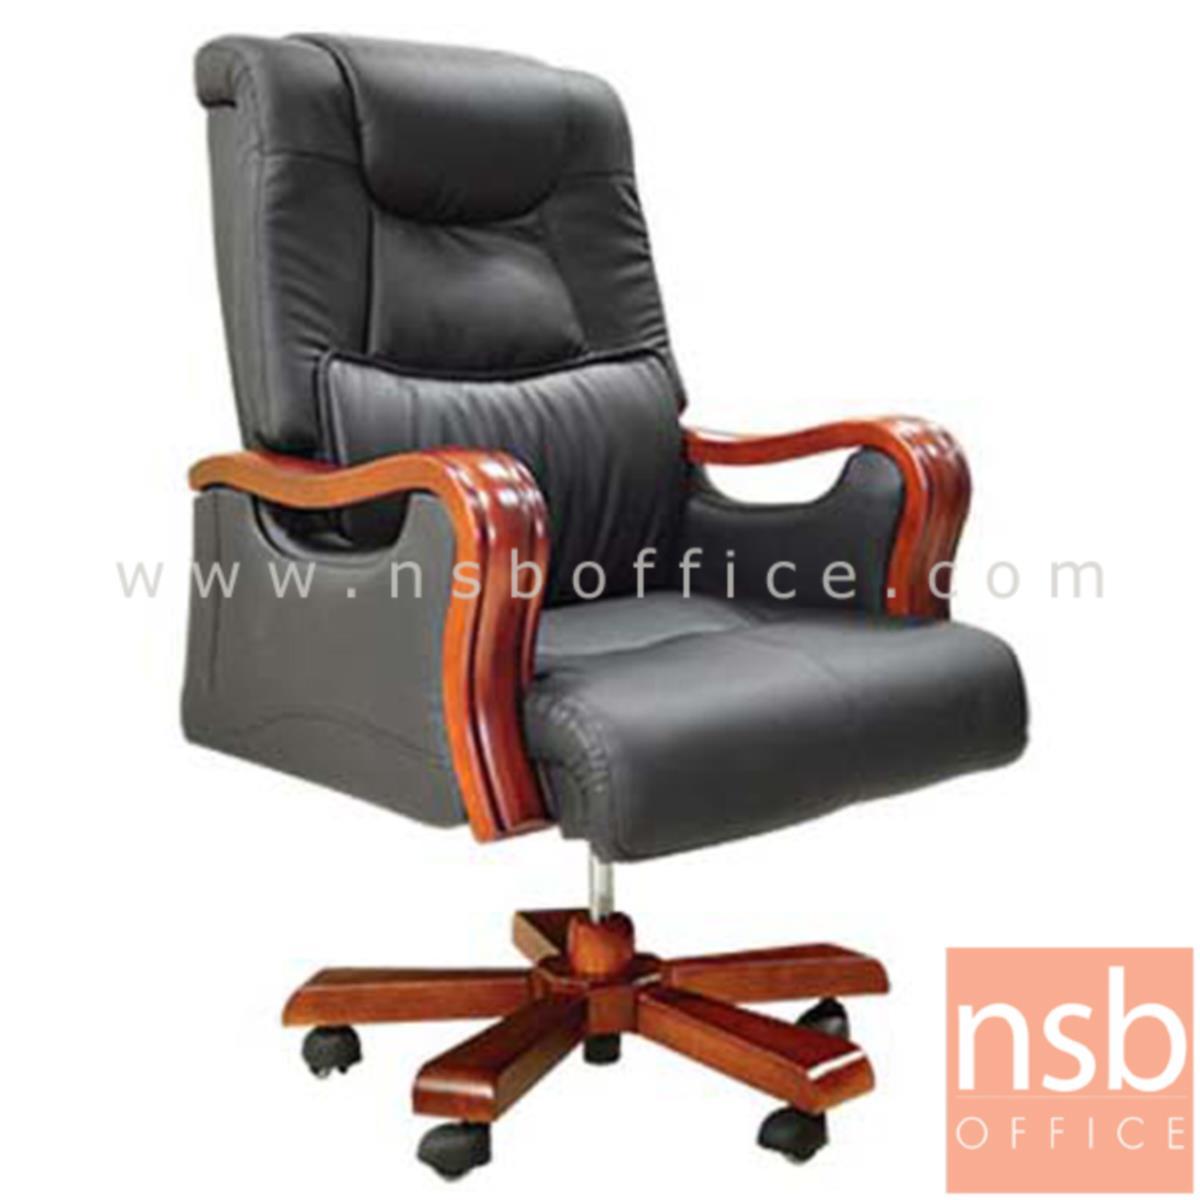 B25A079:เก้าอี้ผู้บริหารหนัง PU  รุ่น  Nolasco (โนแลสโก)  โช๊คแก๊ส มีก้อนโยก ขาไม้